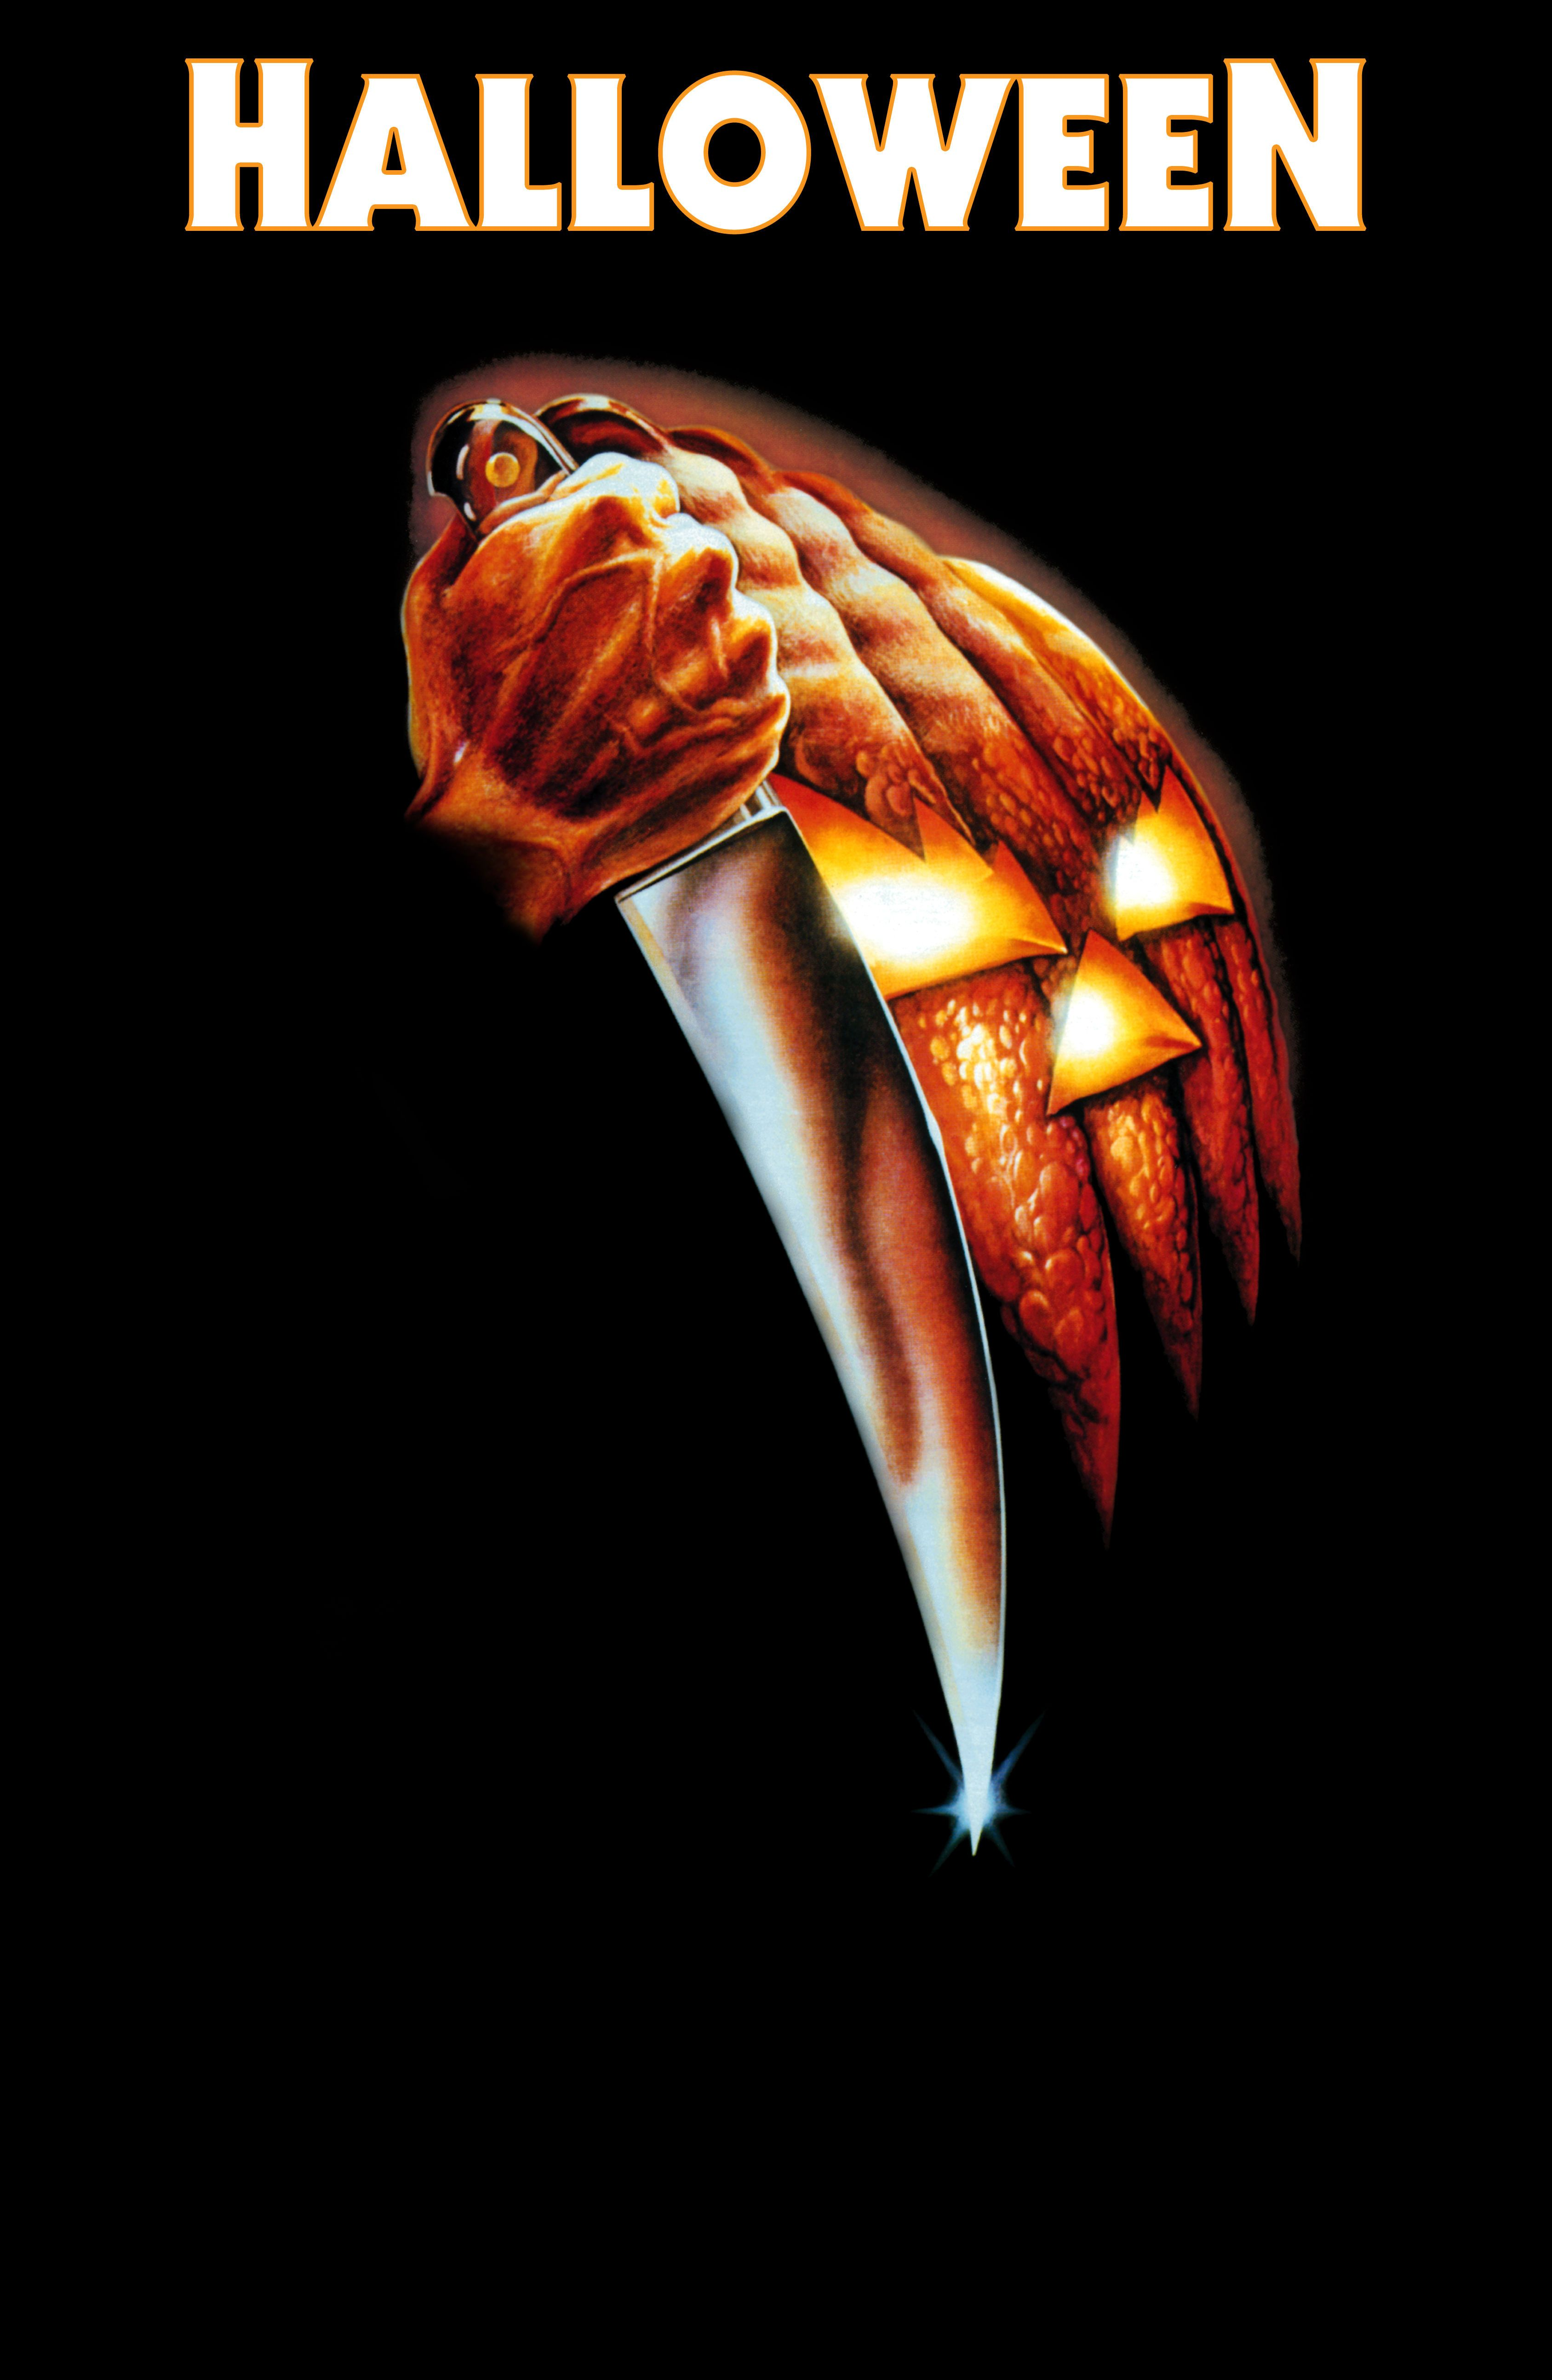 Halloween Full movies online free, Halloween full movie